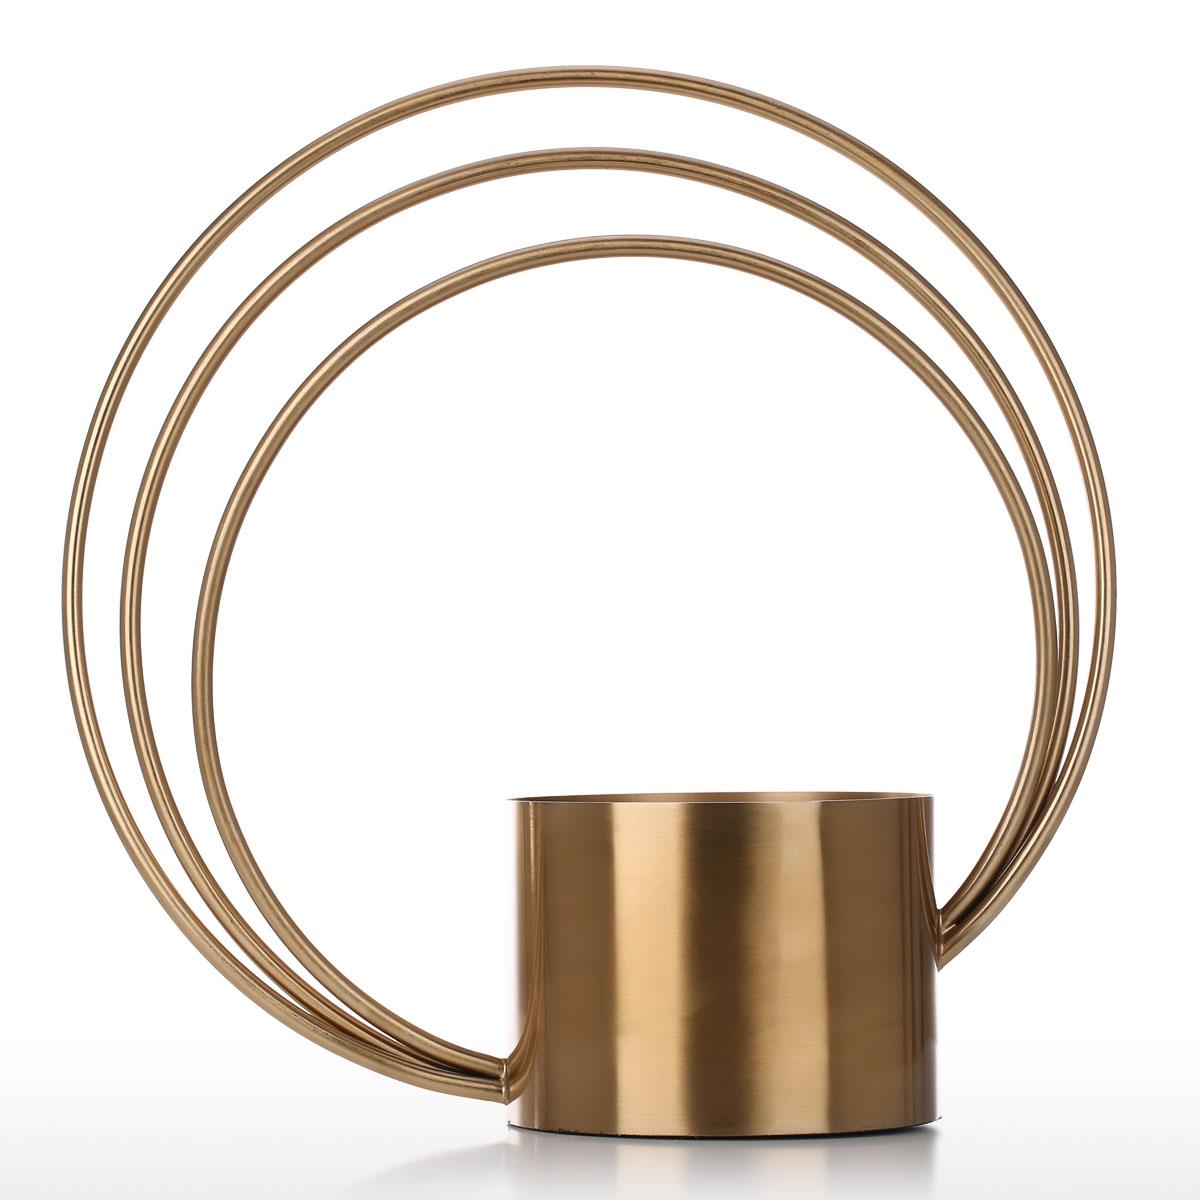 Best and cheap golden round flower pot metal ornament cylinder round flower pot metal ornament cylinder shape metal handle vase fashionable ornament decorative centerpiece for home reviewsmspy